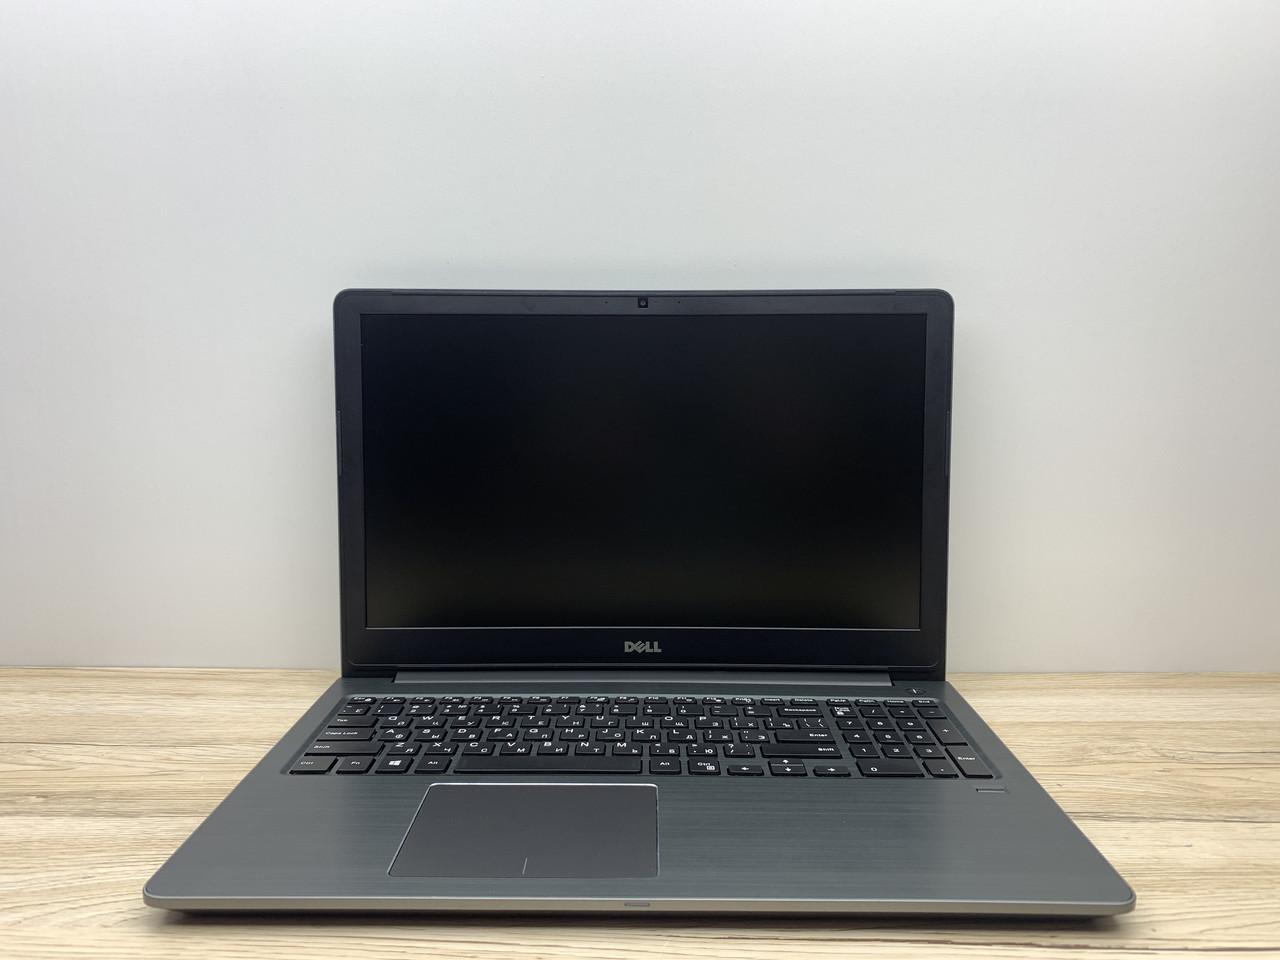 Ноутбук Б/У Dell Vostro 15 556815.6 FHD/ i5-7200U 2(4)x max 3.1GHz/ RAM 8Gb/ SSD 240Gb/ АКБ 38Wh/ Сост. 8